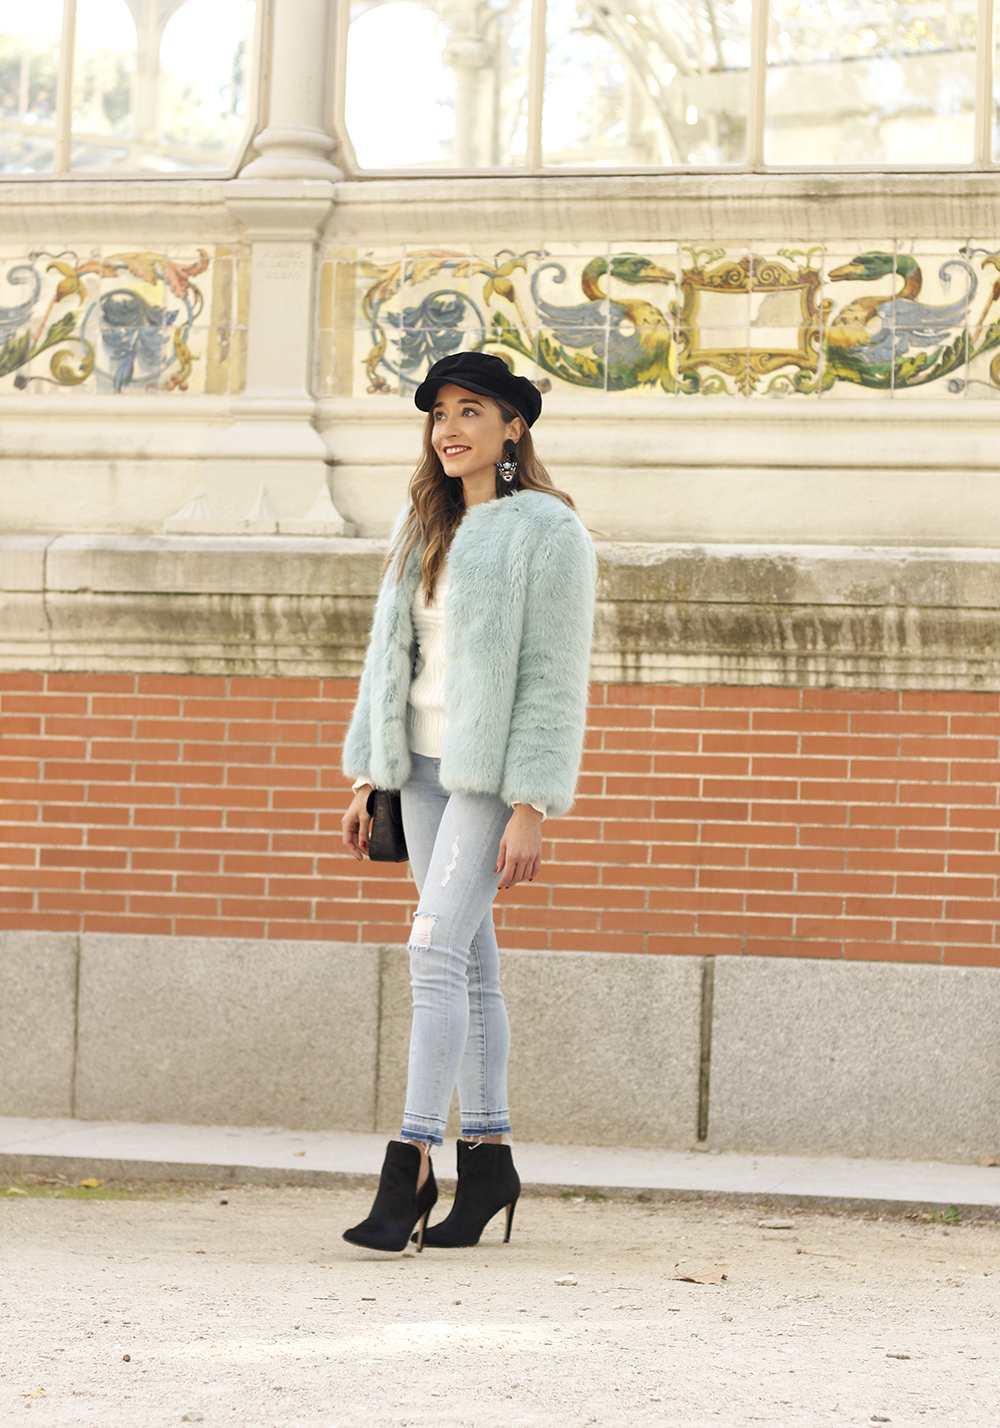 blue light faux fur coat navy cap ripped jeans zara tiger uterqüe earrings outfit street style06